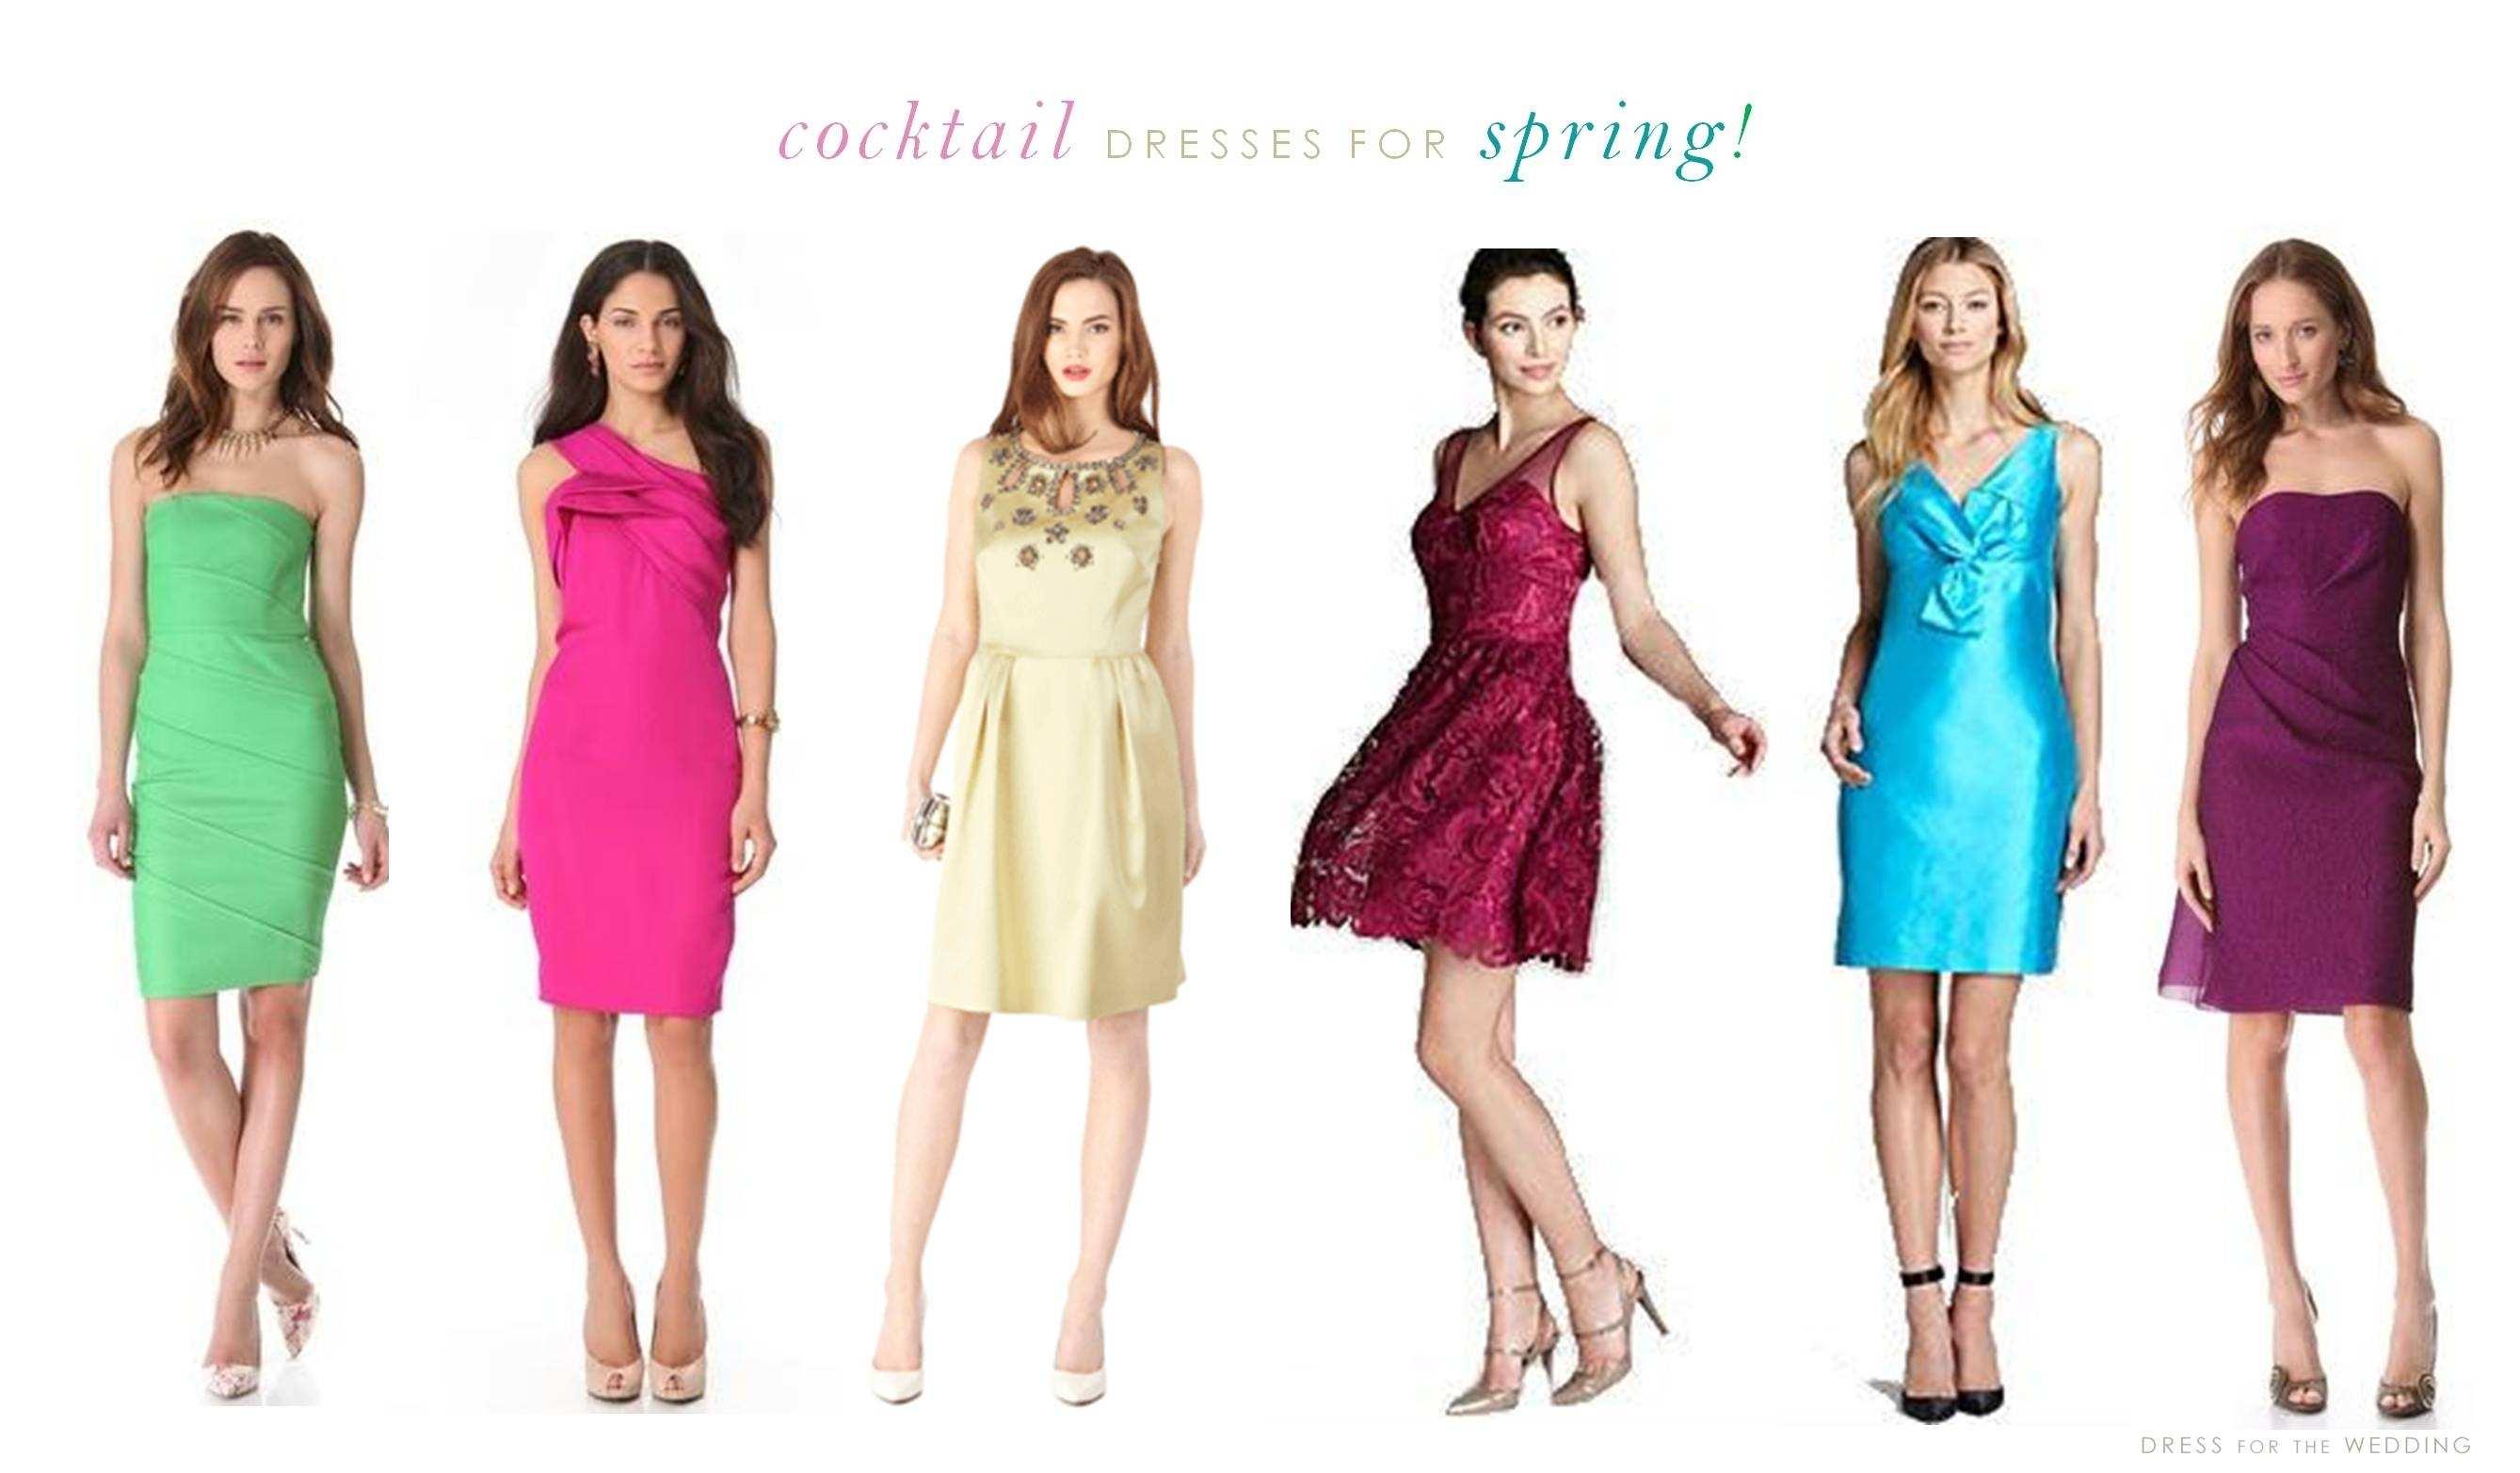 Dress Dress Cocktail cho